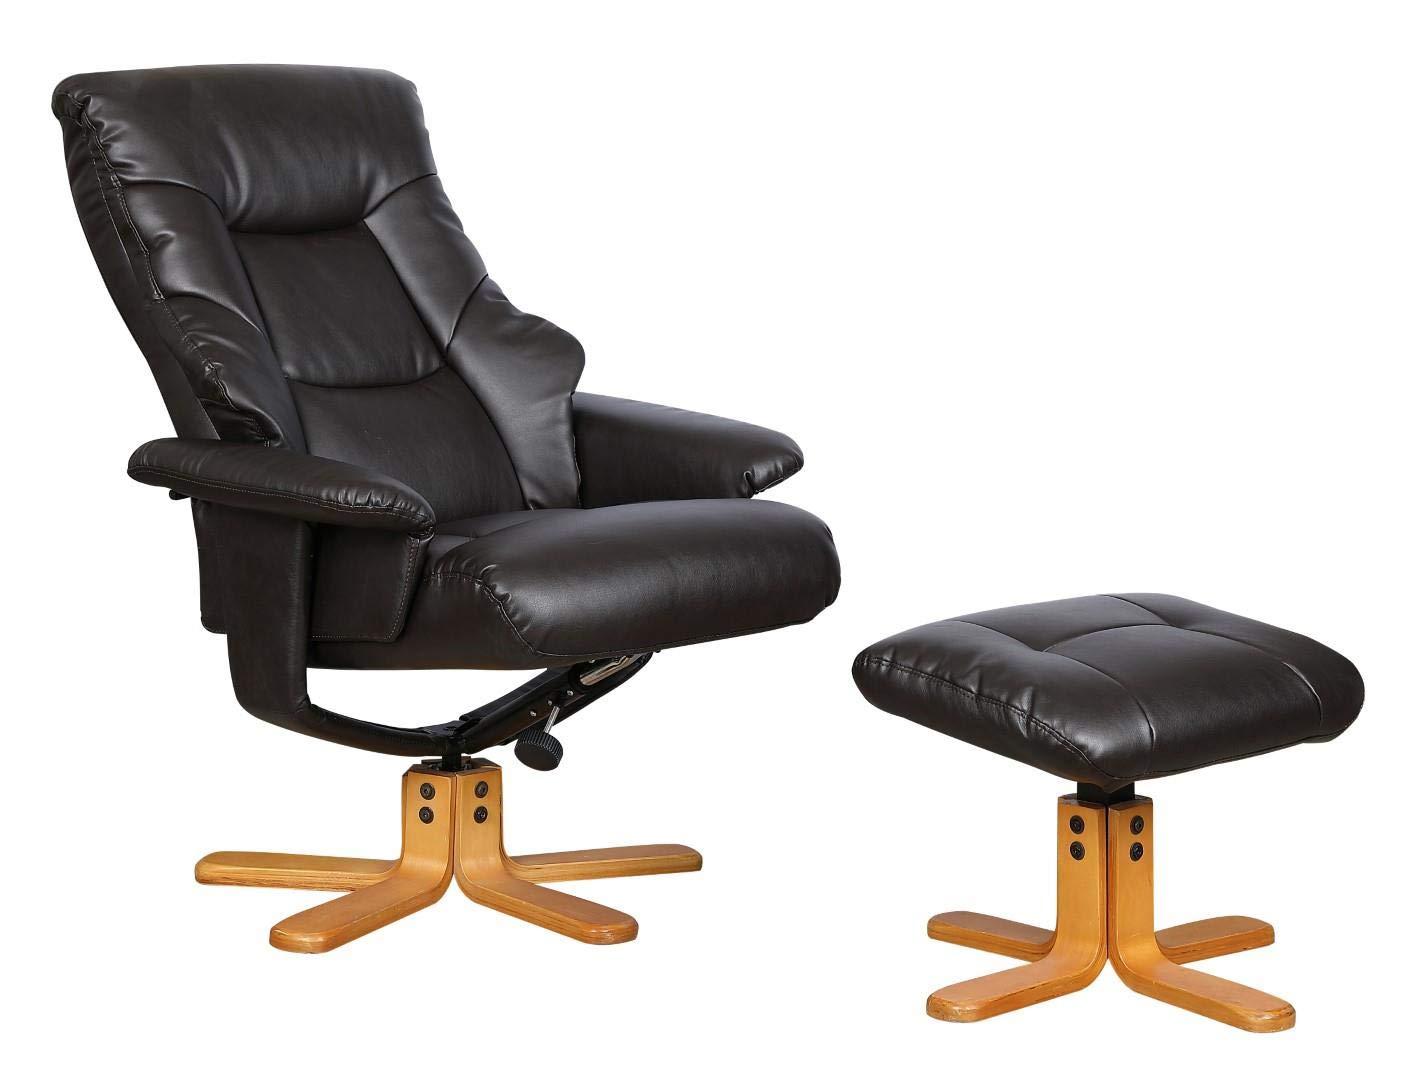 Phenomenal Gfa Shanghai Bonded Leather Swivel Recliner Chair Matching Evergreenethics Interior Chair Design Evergreenethicsorg